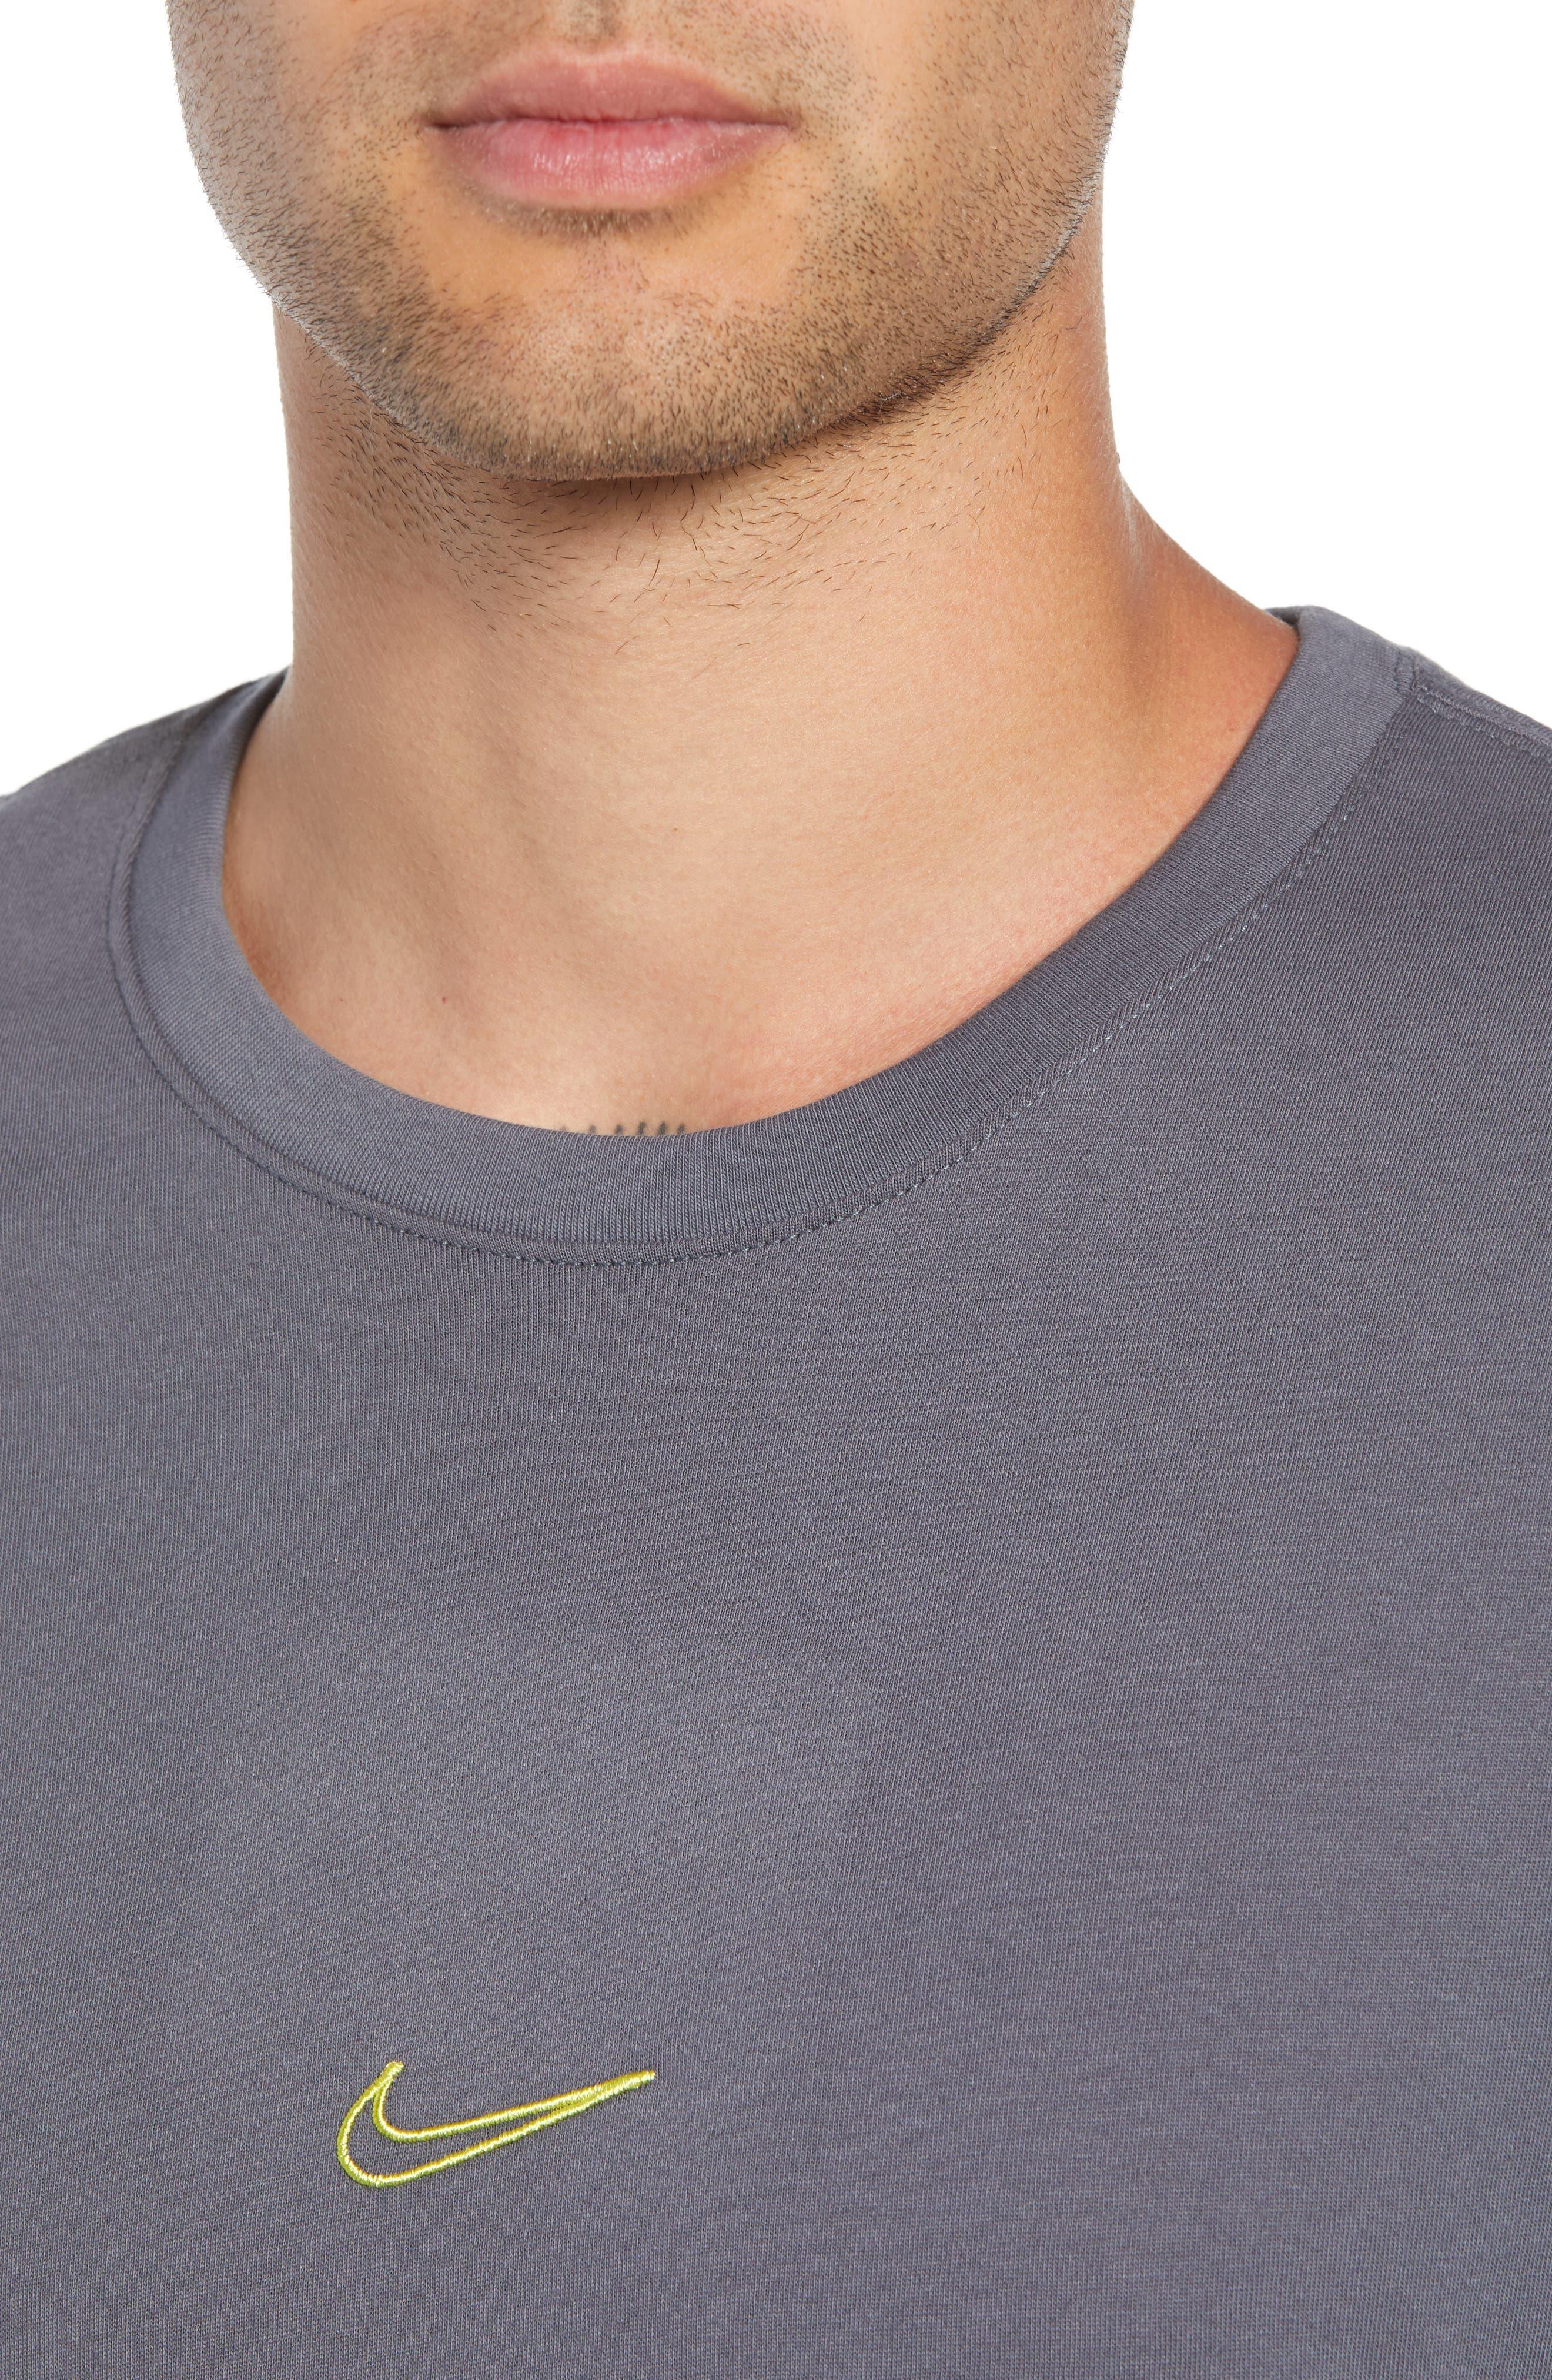 SB Dry Tropical Graphic T-Shirt,                             Alternate thumbnail 4, color,                             DARK GREY/ DYNAMIC YELLOW